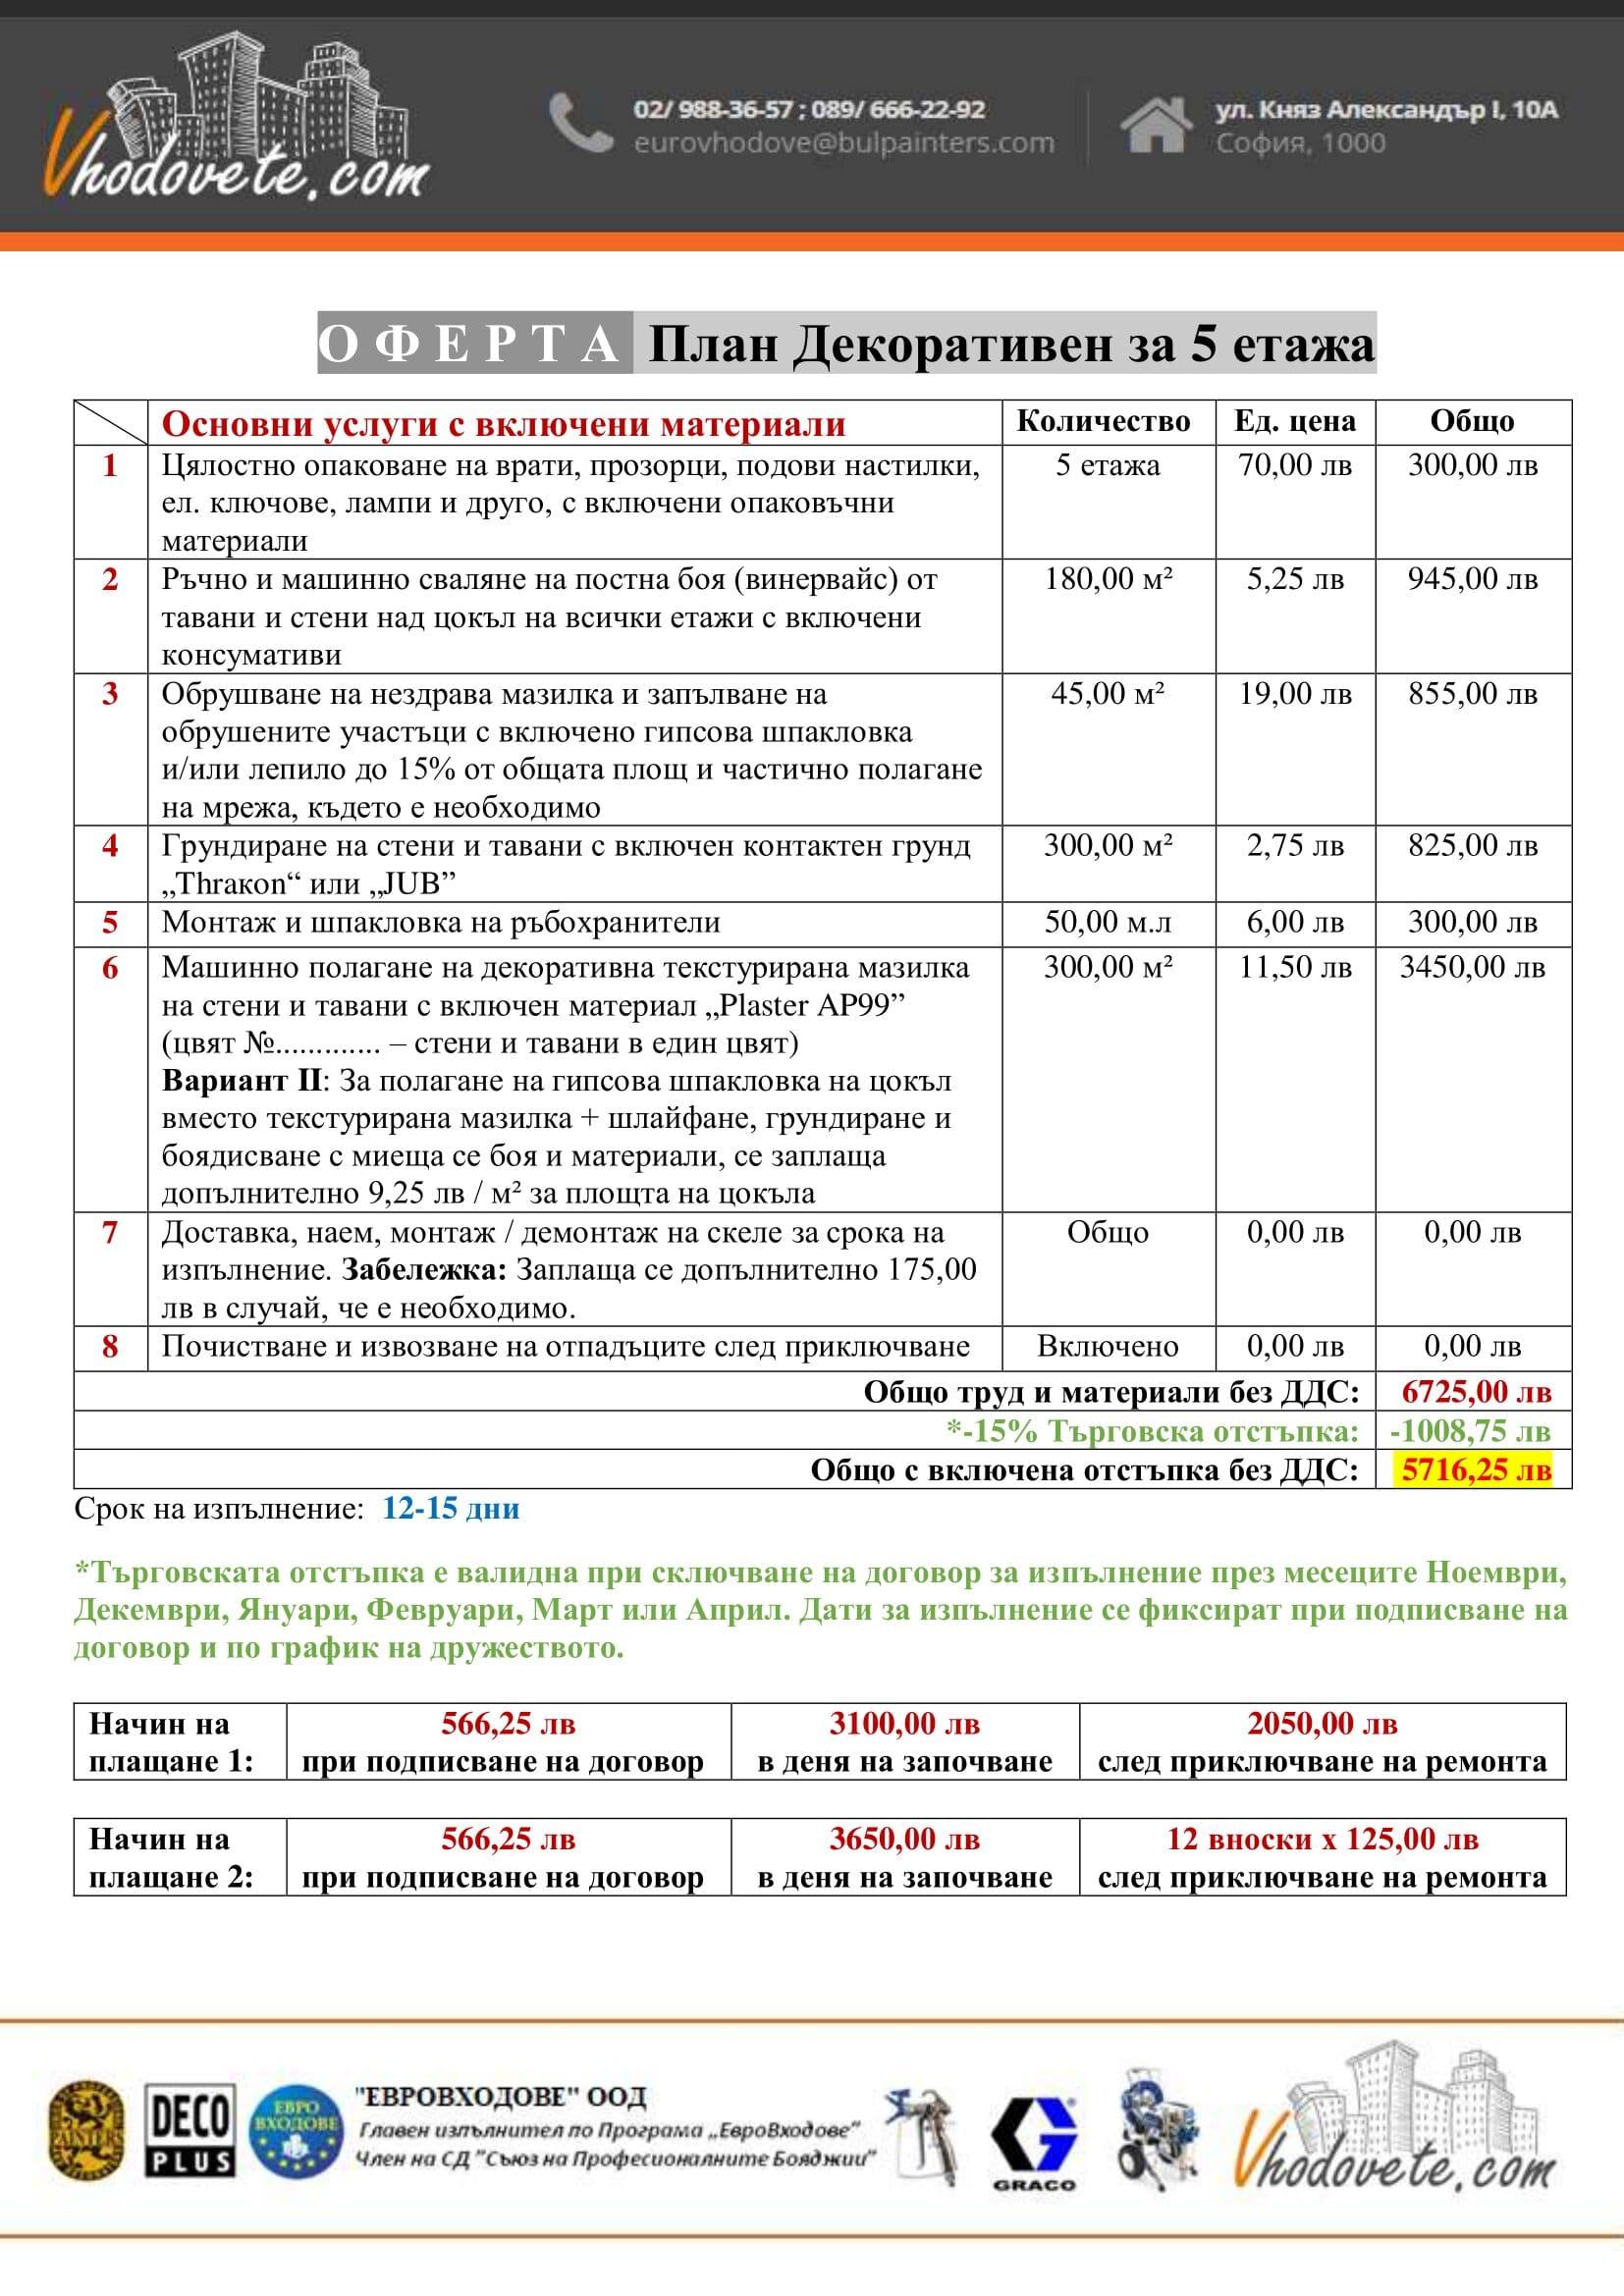 3-Oferta-za-5-et-Dekorativen-01102020